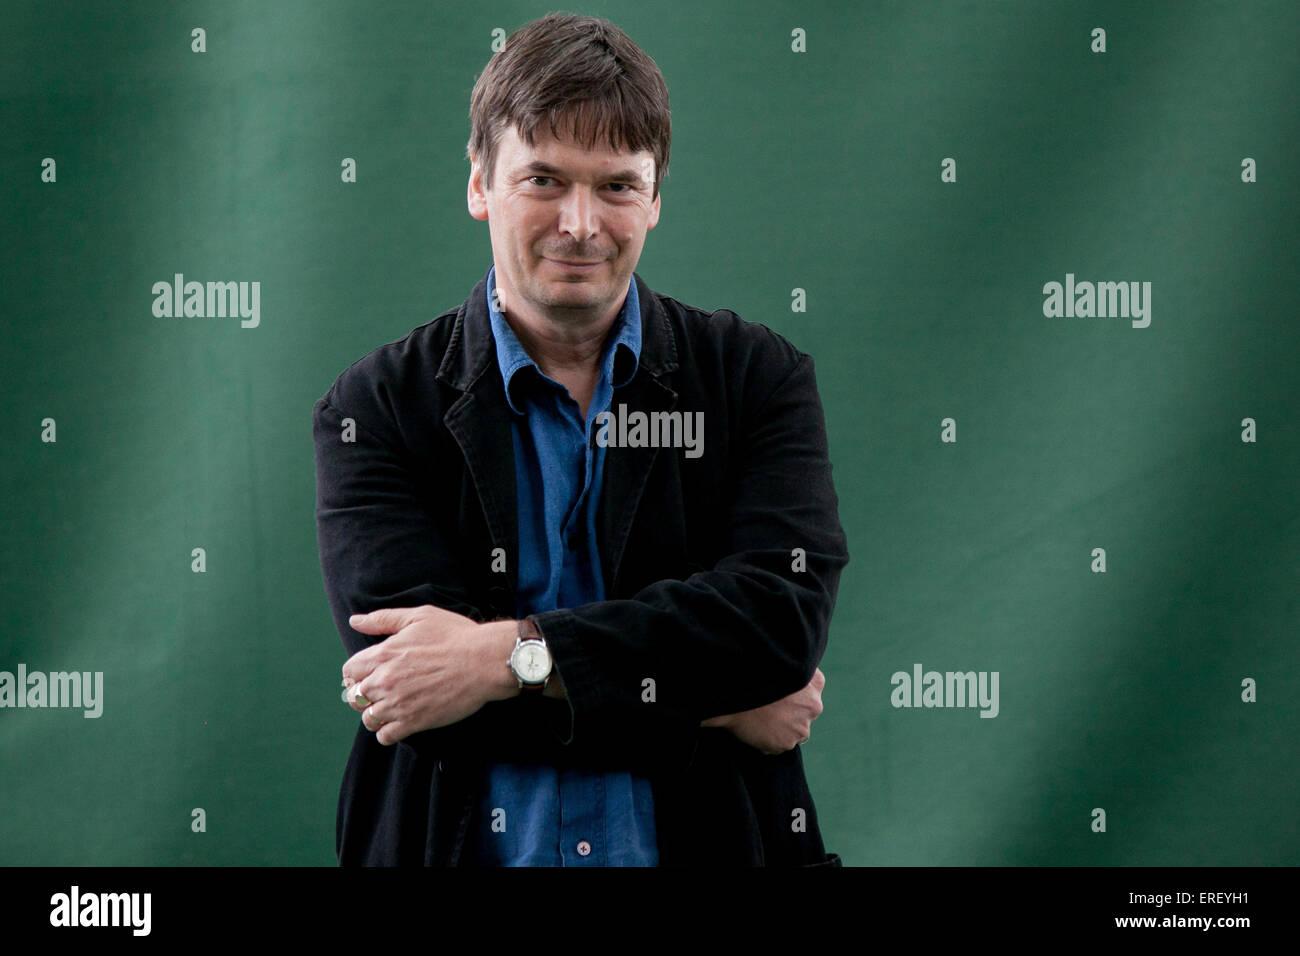 Ian Rankin at the Edinburgh International Book Festival 2011. Scottish crime writer, best known for his Inspector - Stock Image